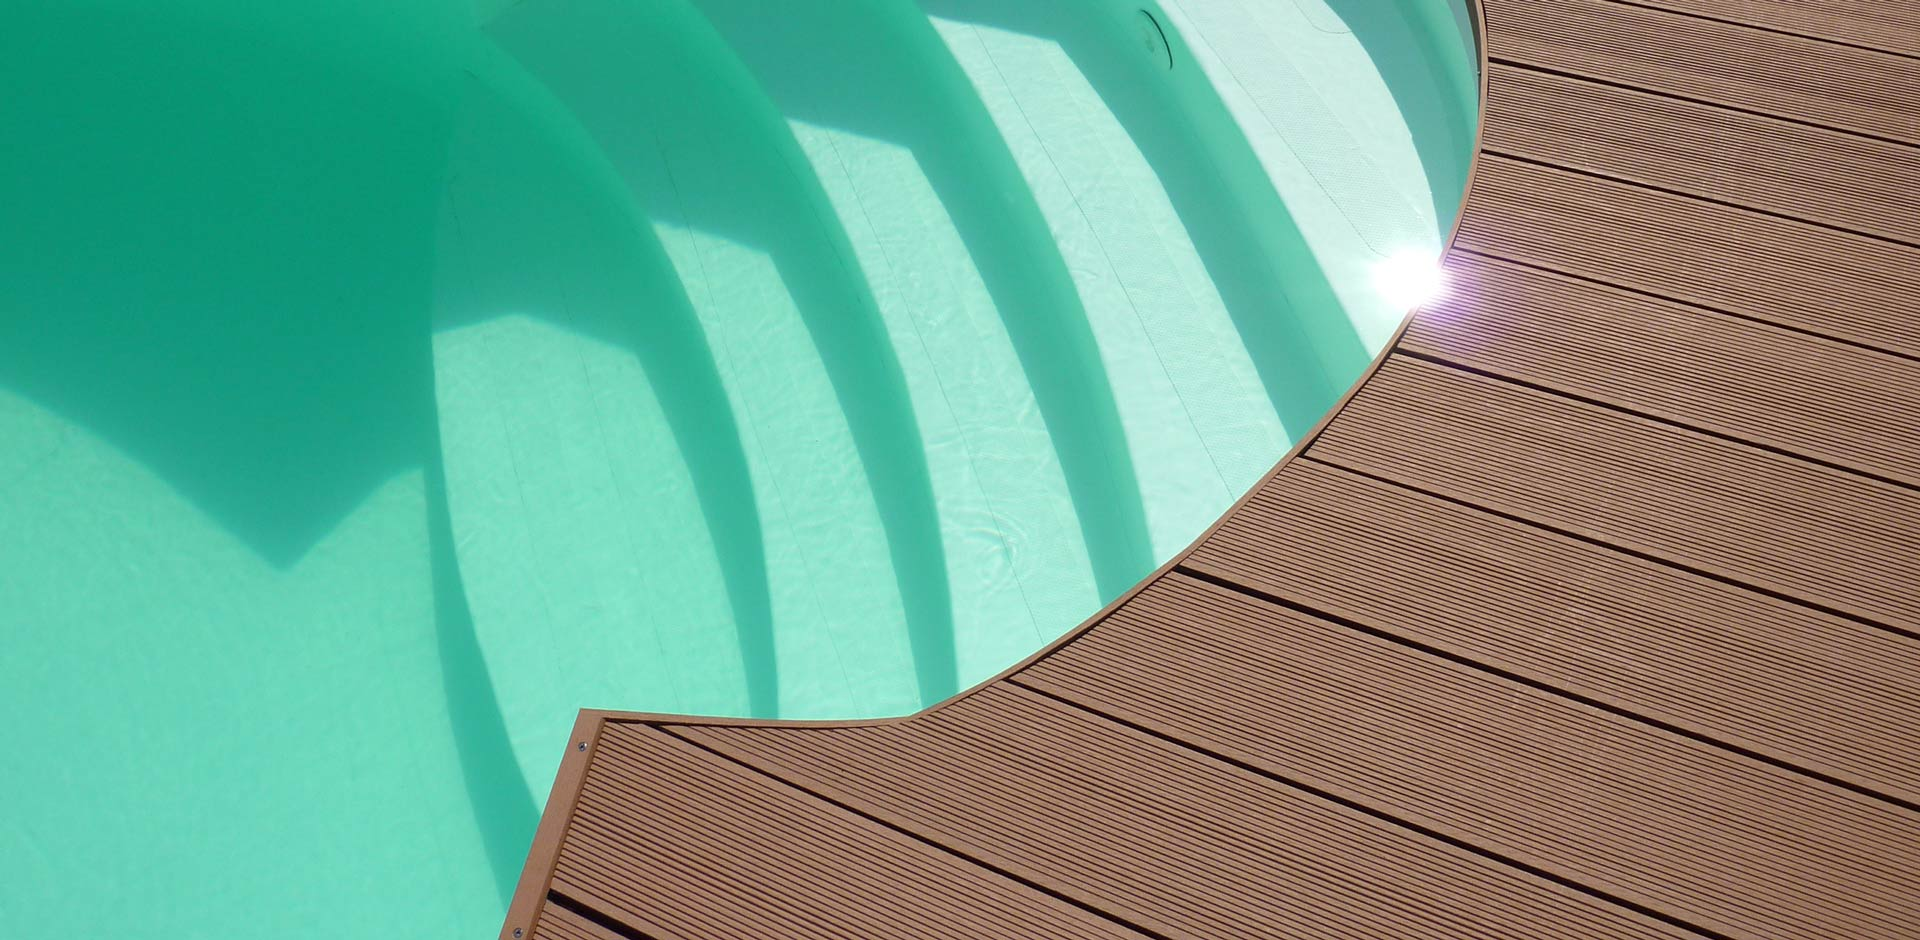 Terrassendielen Ipe am Pool | Der Parkett Riese Köln